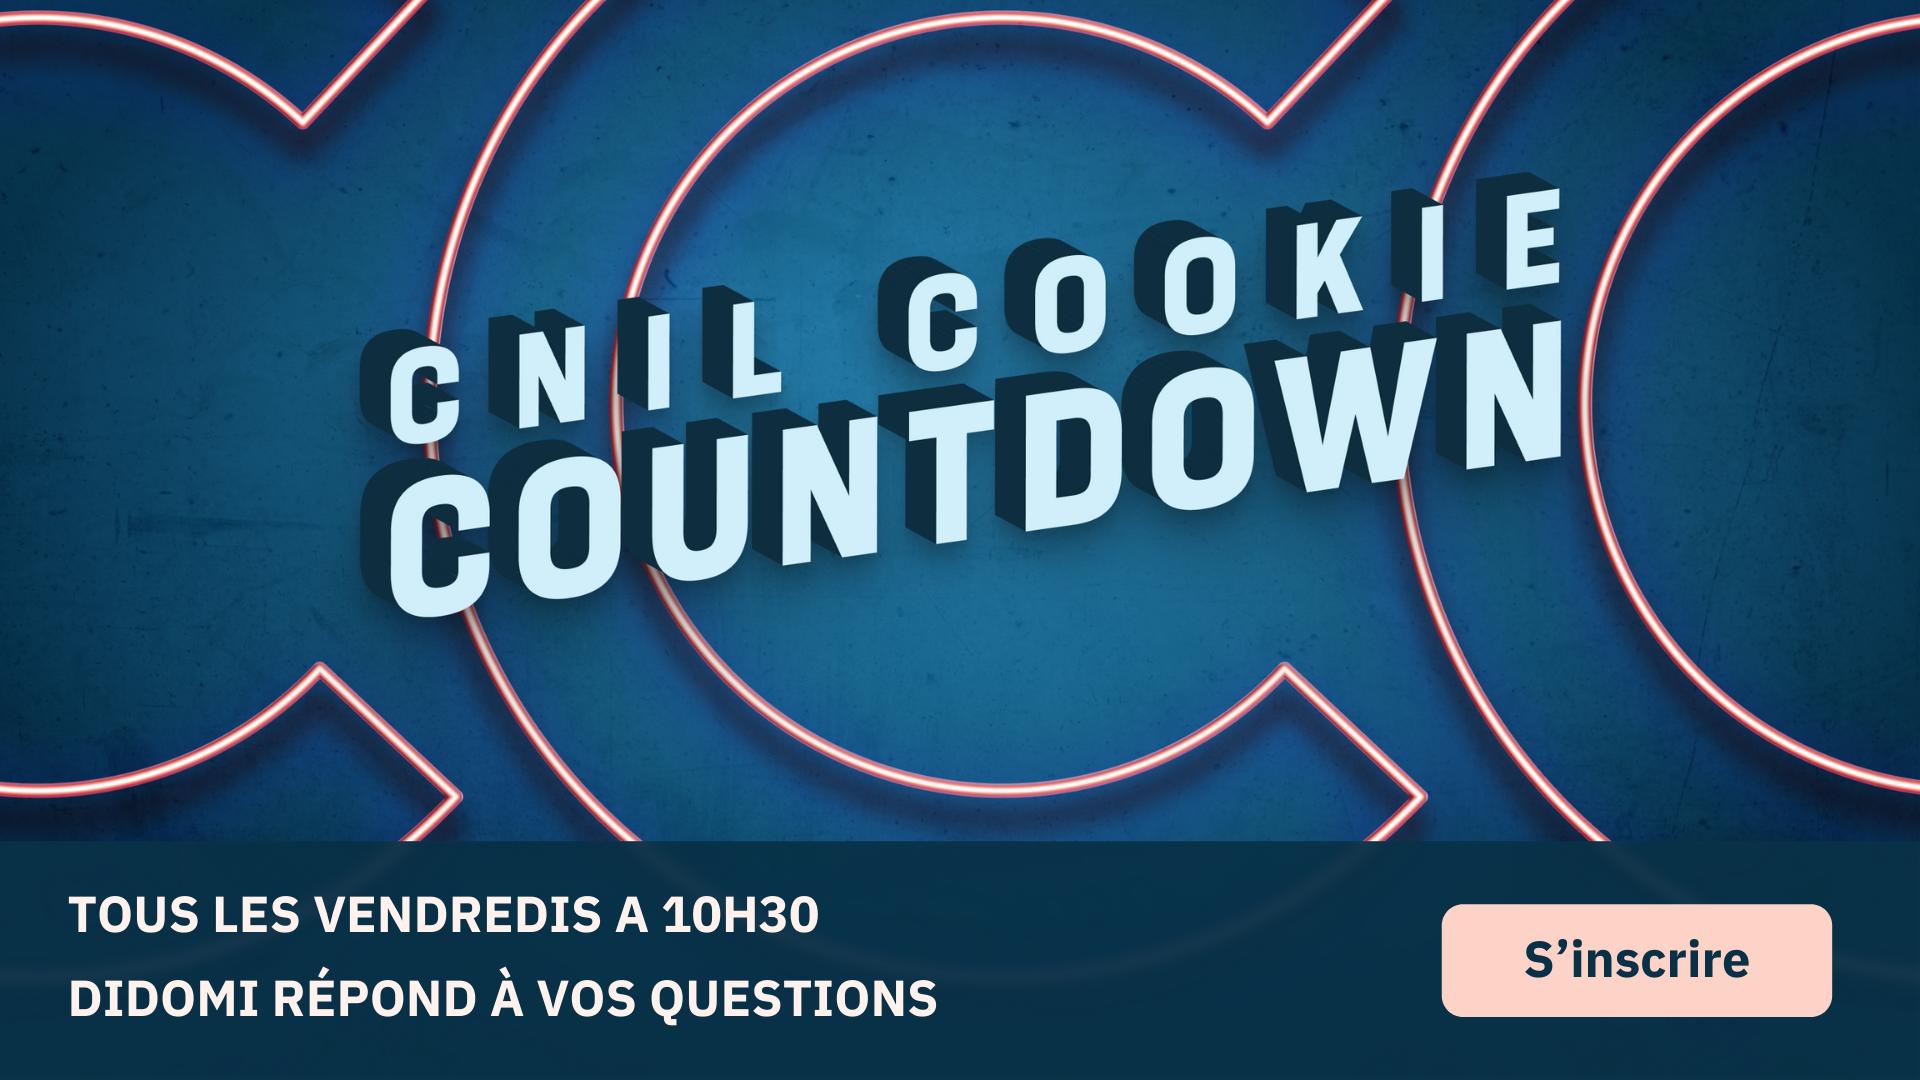 https://app.livestorm.co/didomi/cnil-cookie-countdown-chaque-vendredi-didomi-repond-a-vos-questions